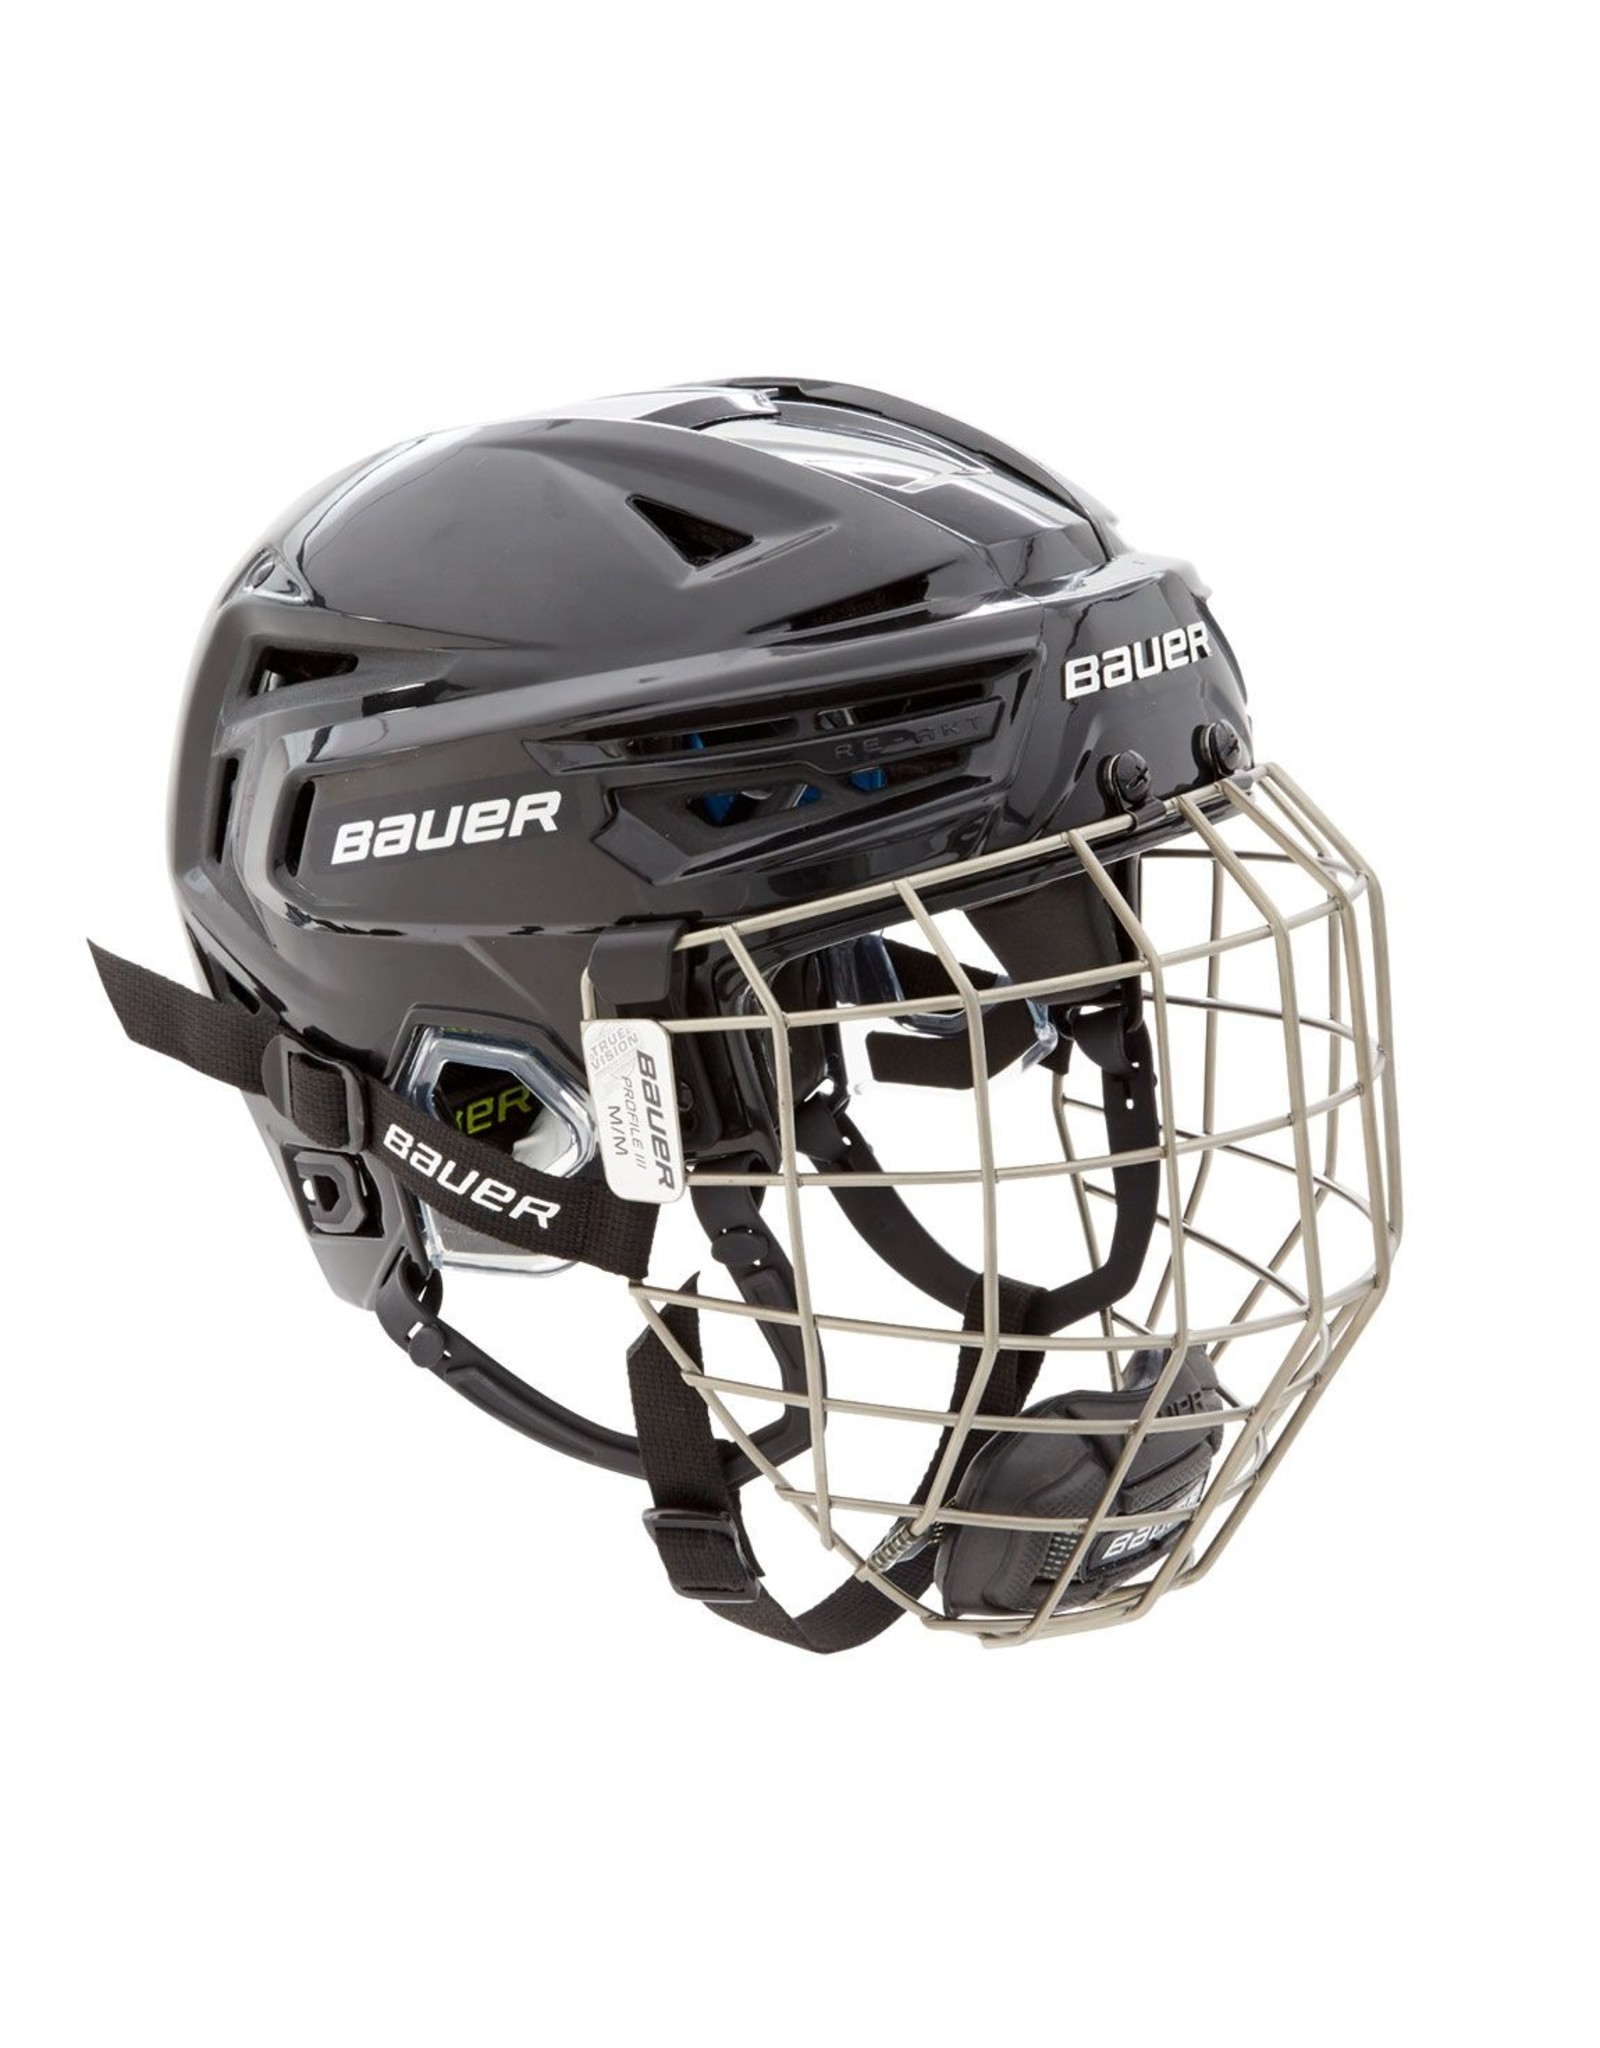 Bauer Hockey - Canada BAUER RE-AKT 150 HELMET COMBO